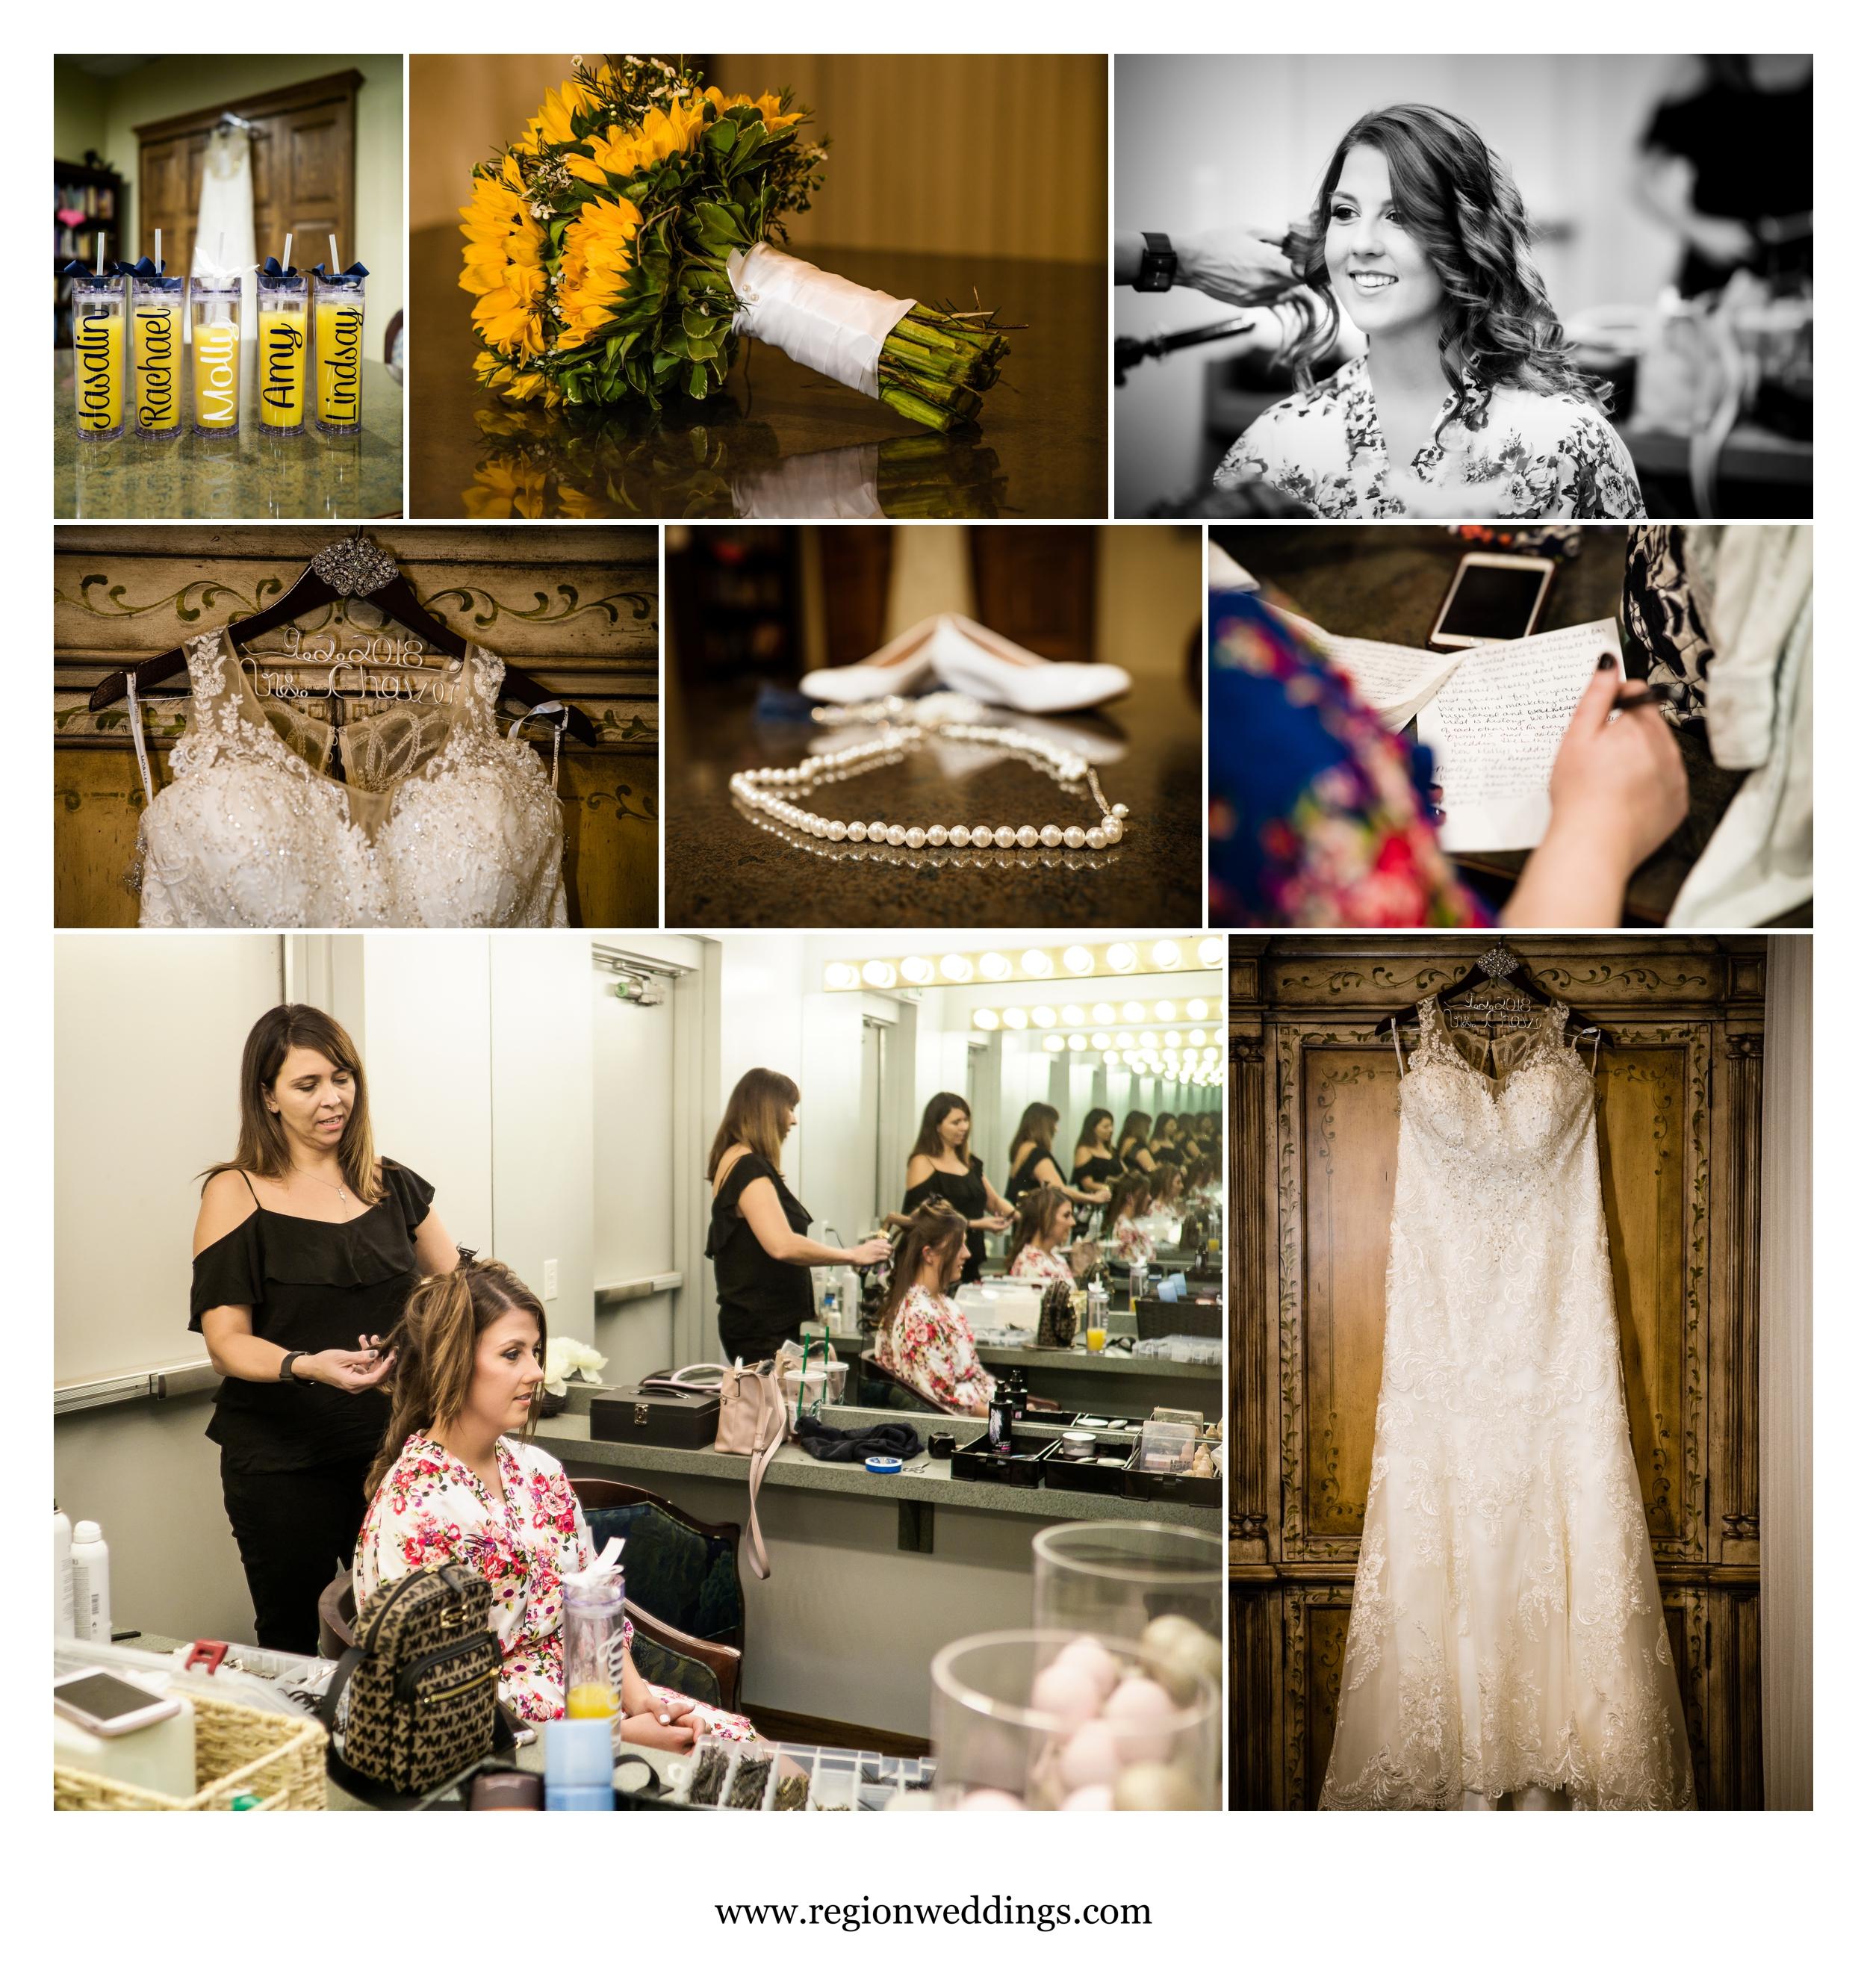 Prep in the bridal suite of Briar Ridge Country Club.